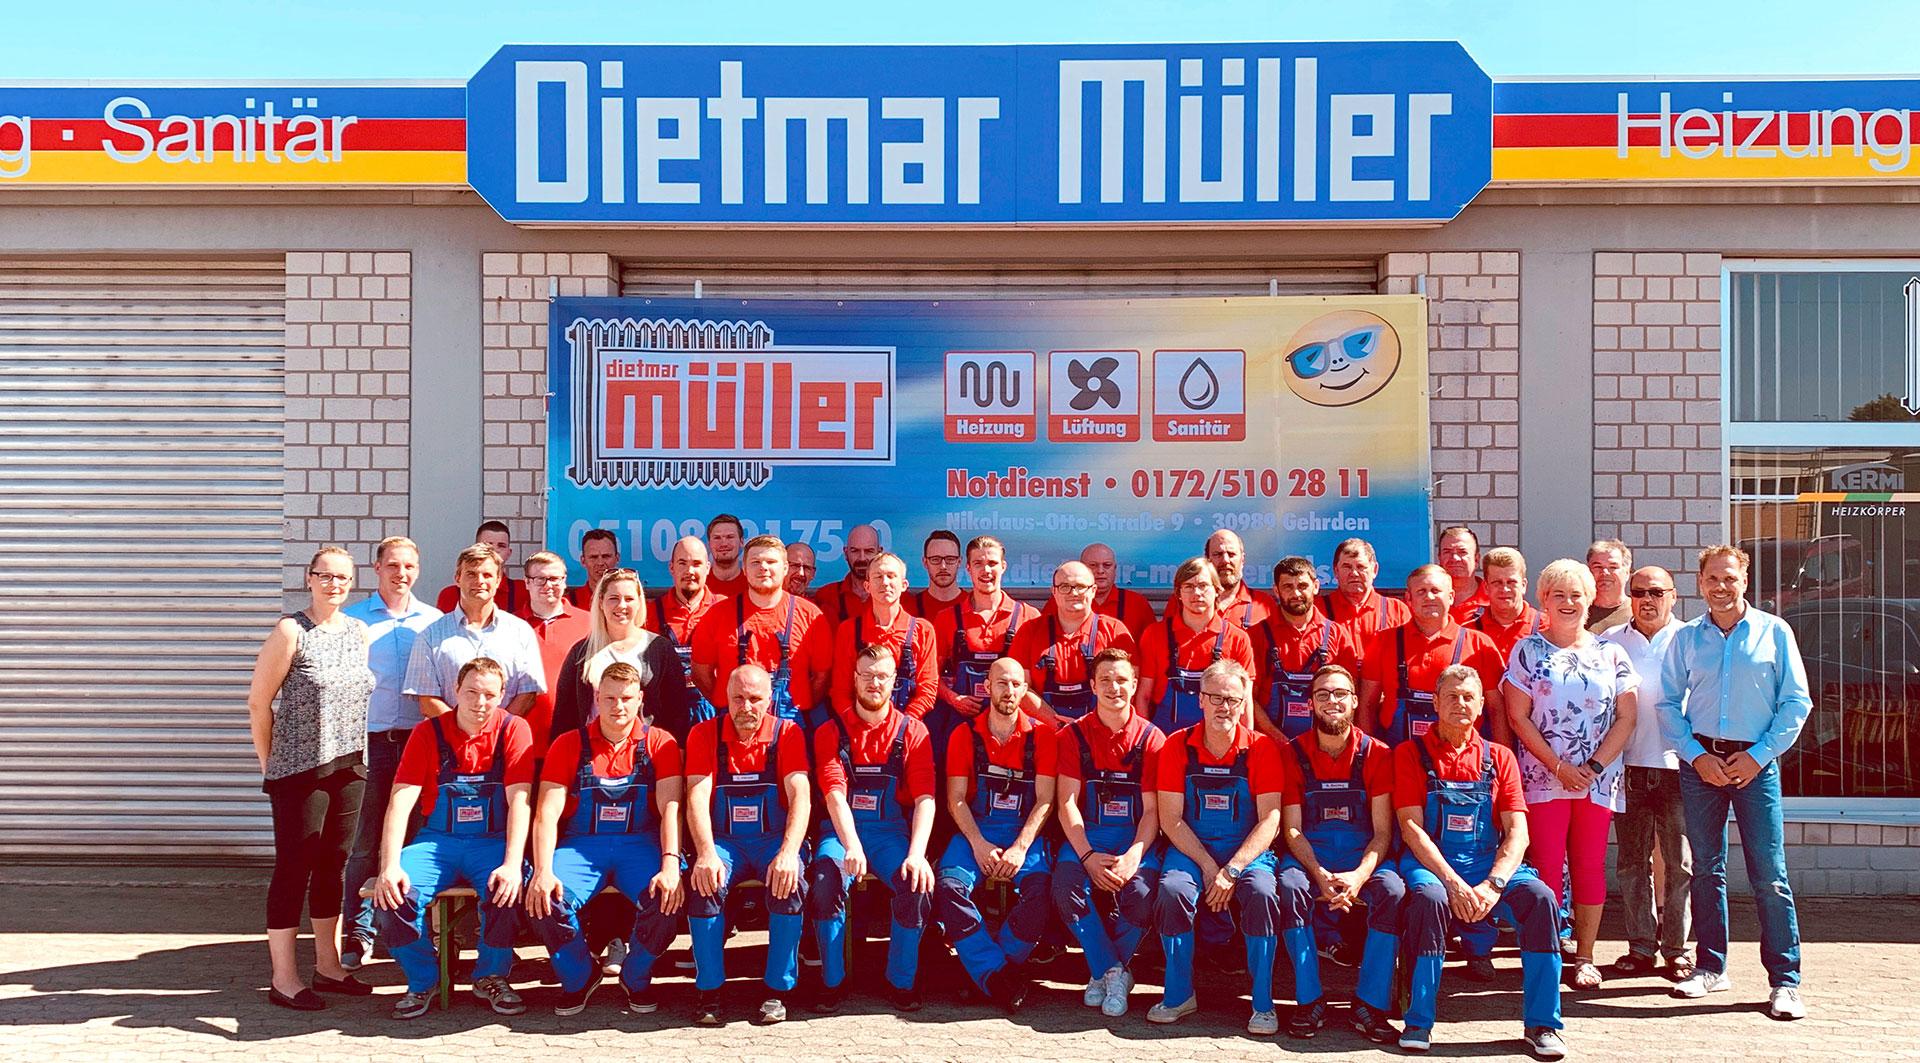 Solvis Heizung Dietmar Müller 30989 Gehrden